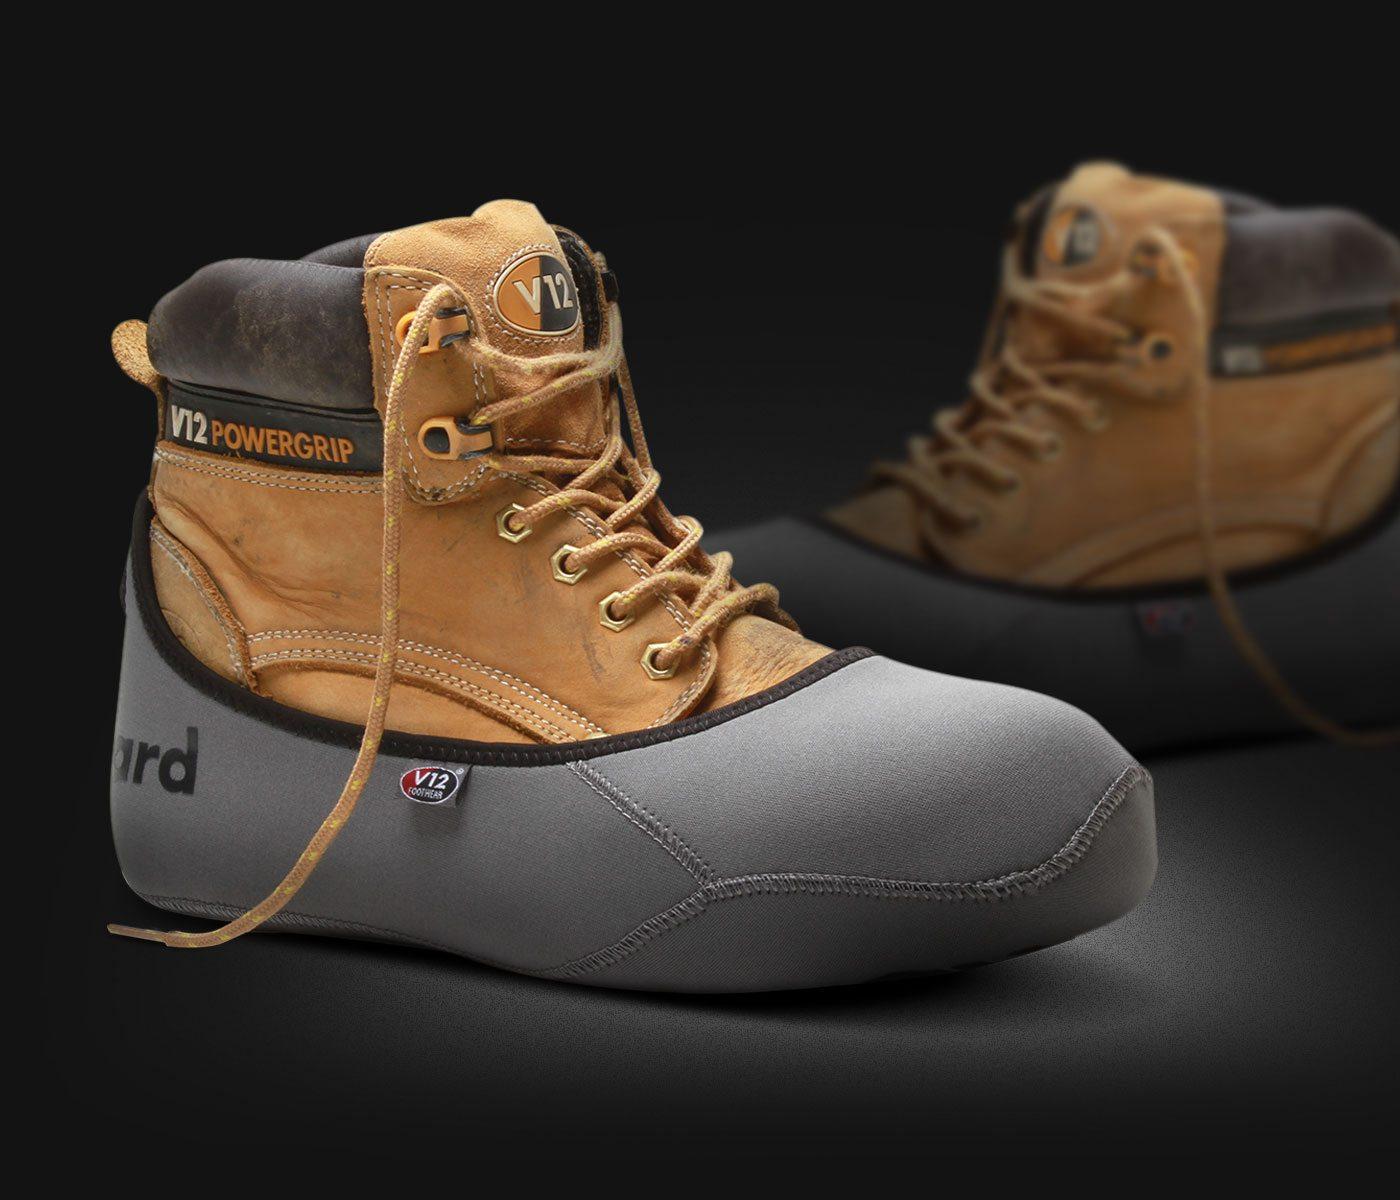 V12 Footwear MukGuard Product Photography Puma Work Boot